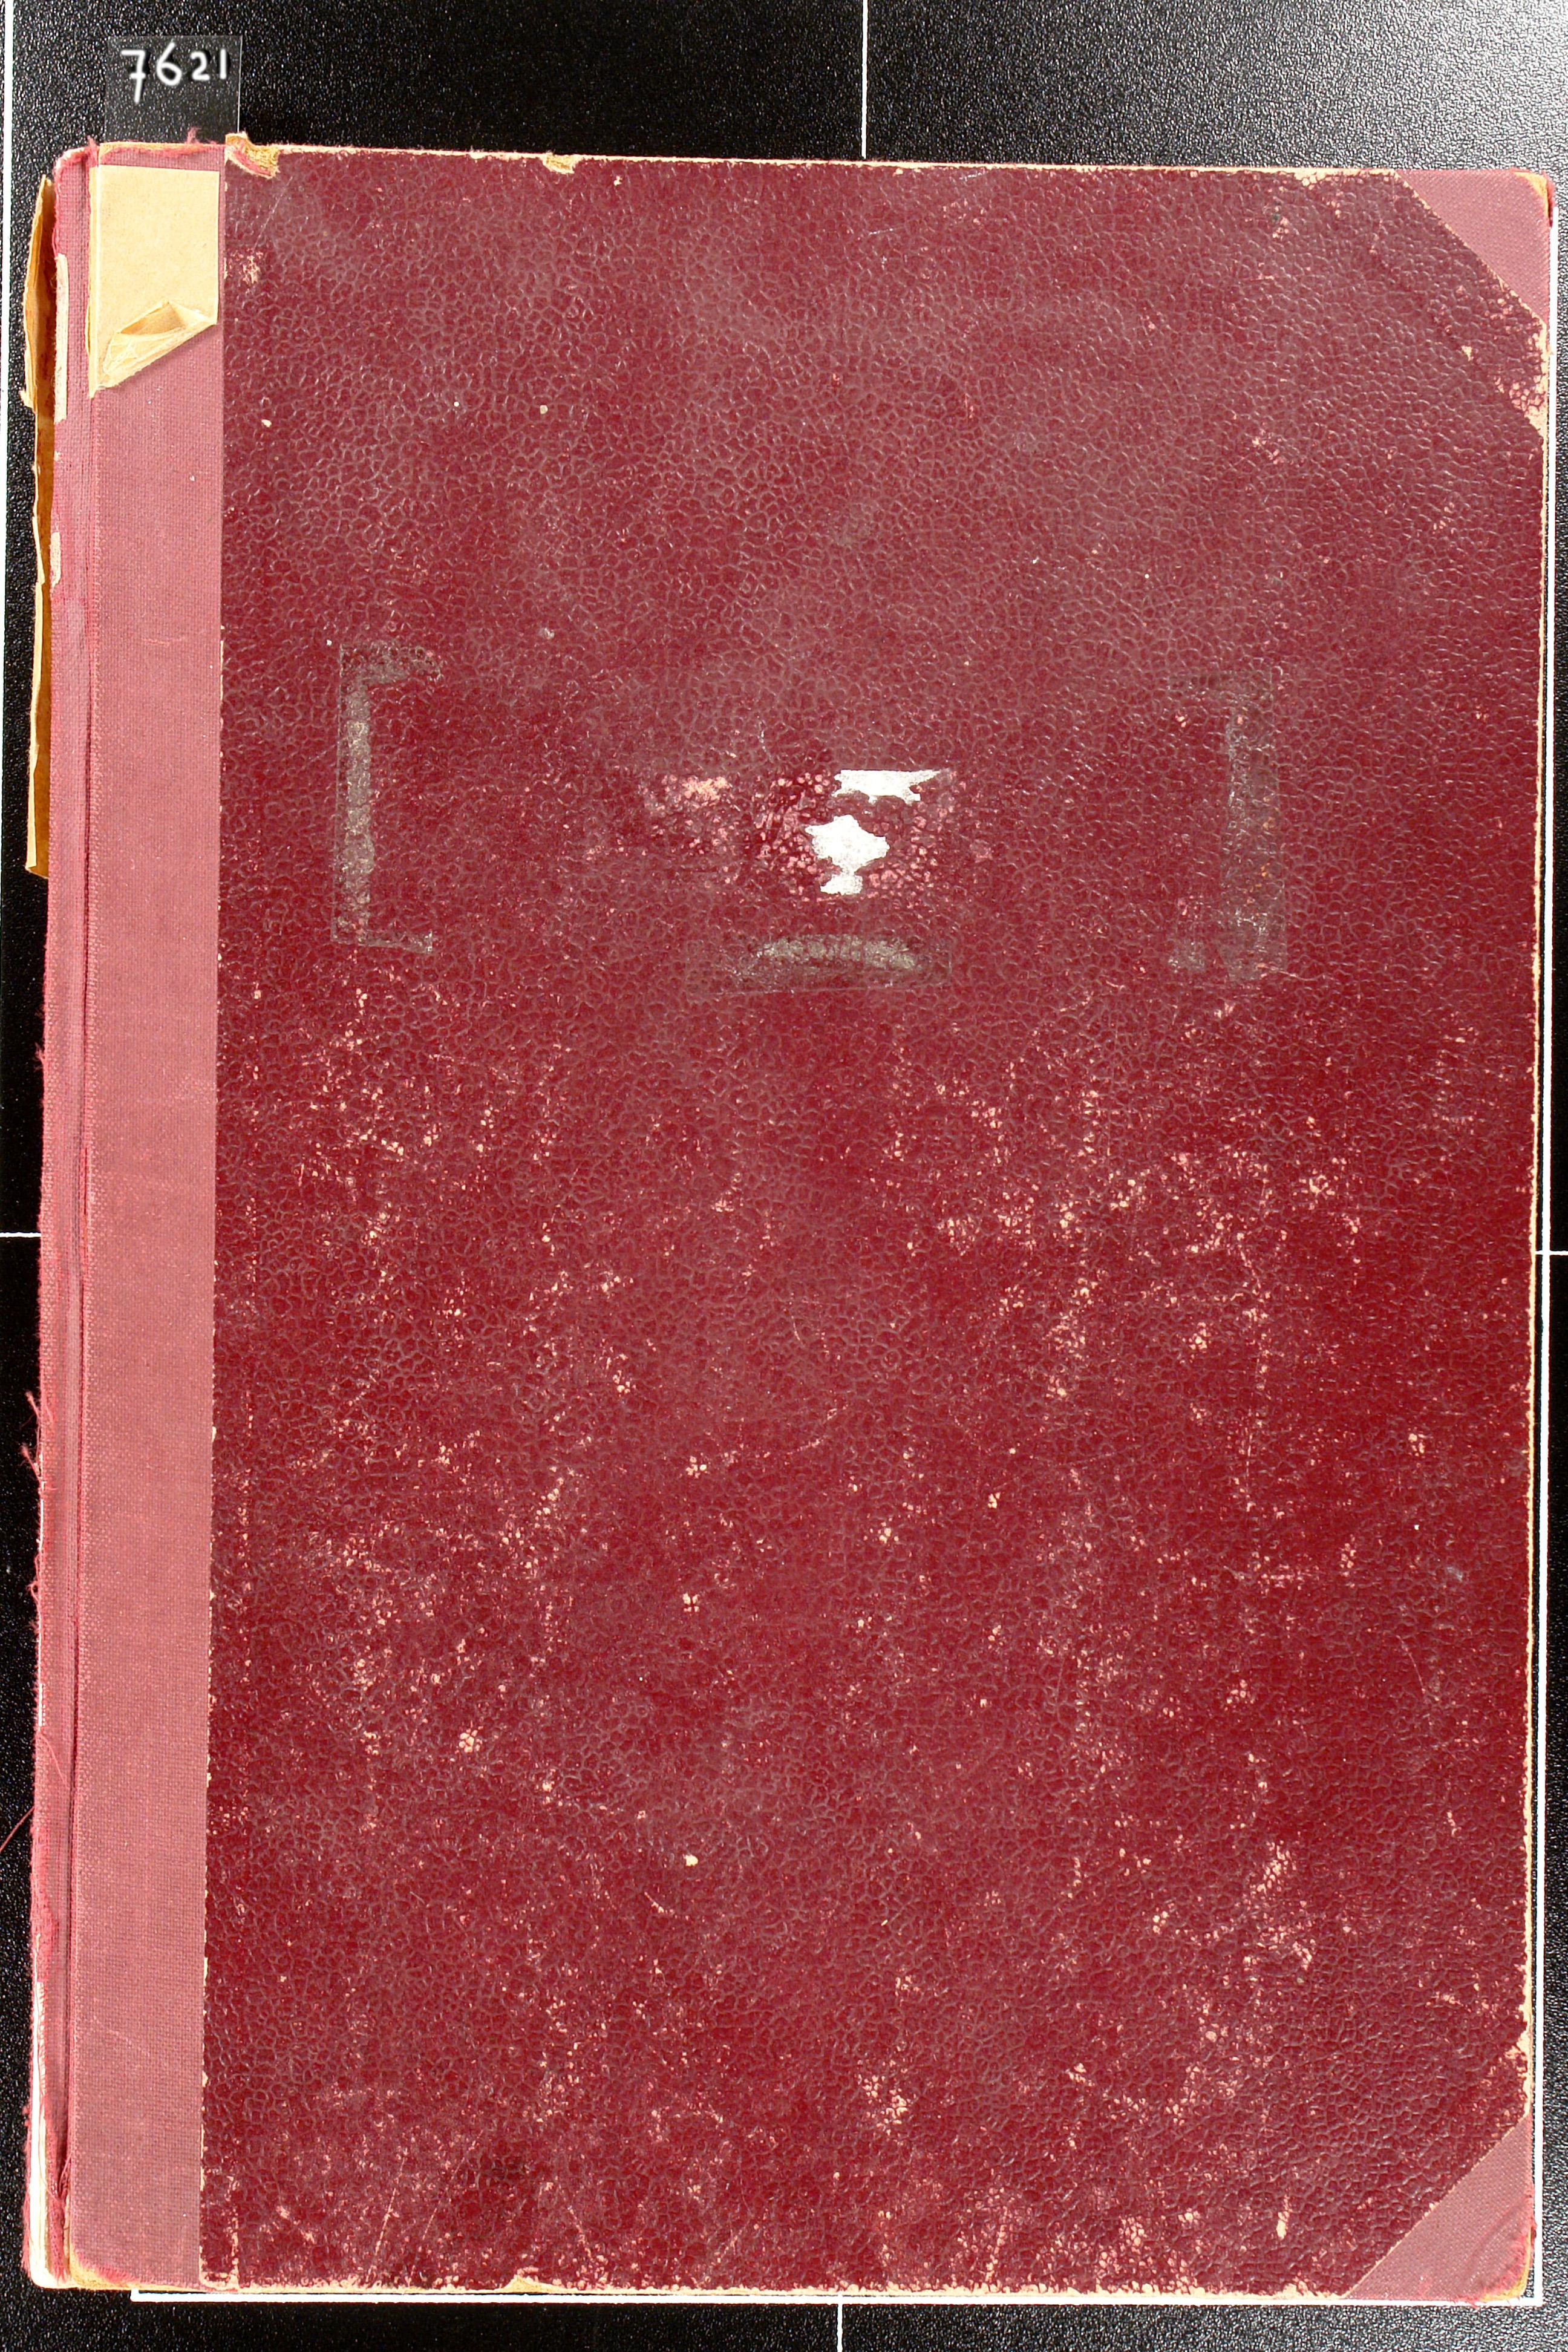 Boek. Voorraadboek voor ethyl alcohol, 1959-1981